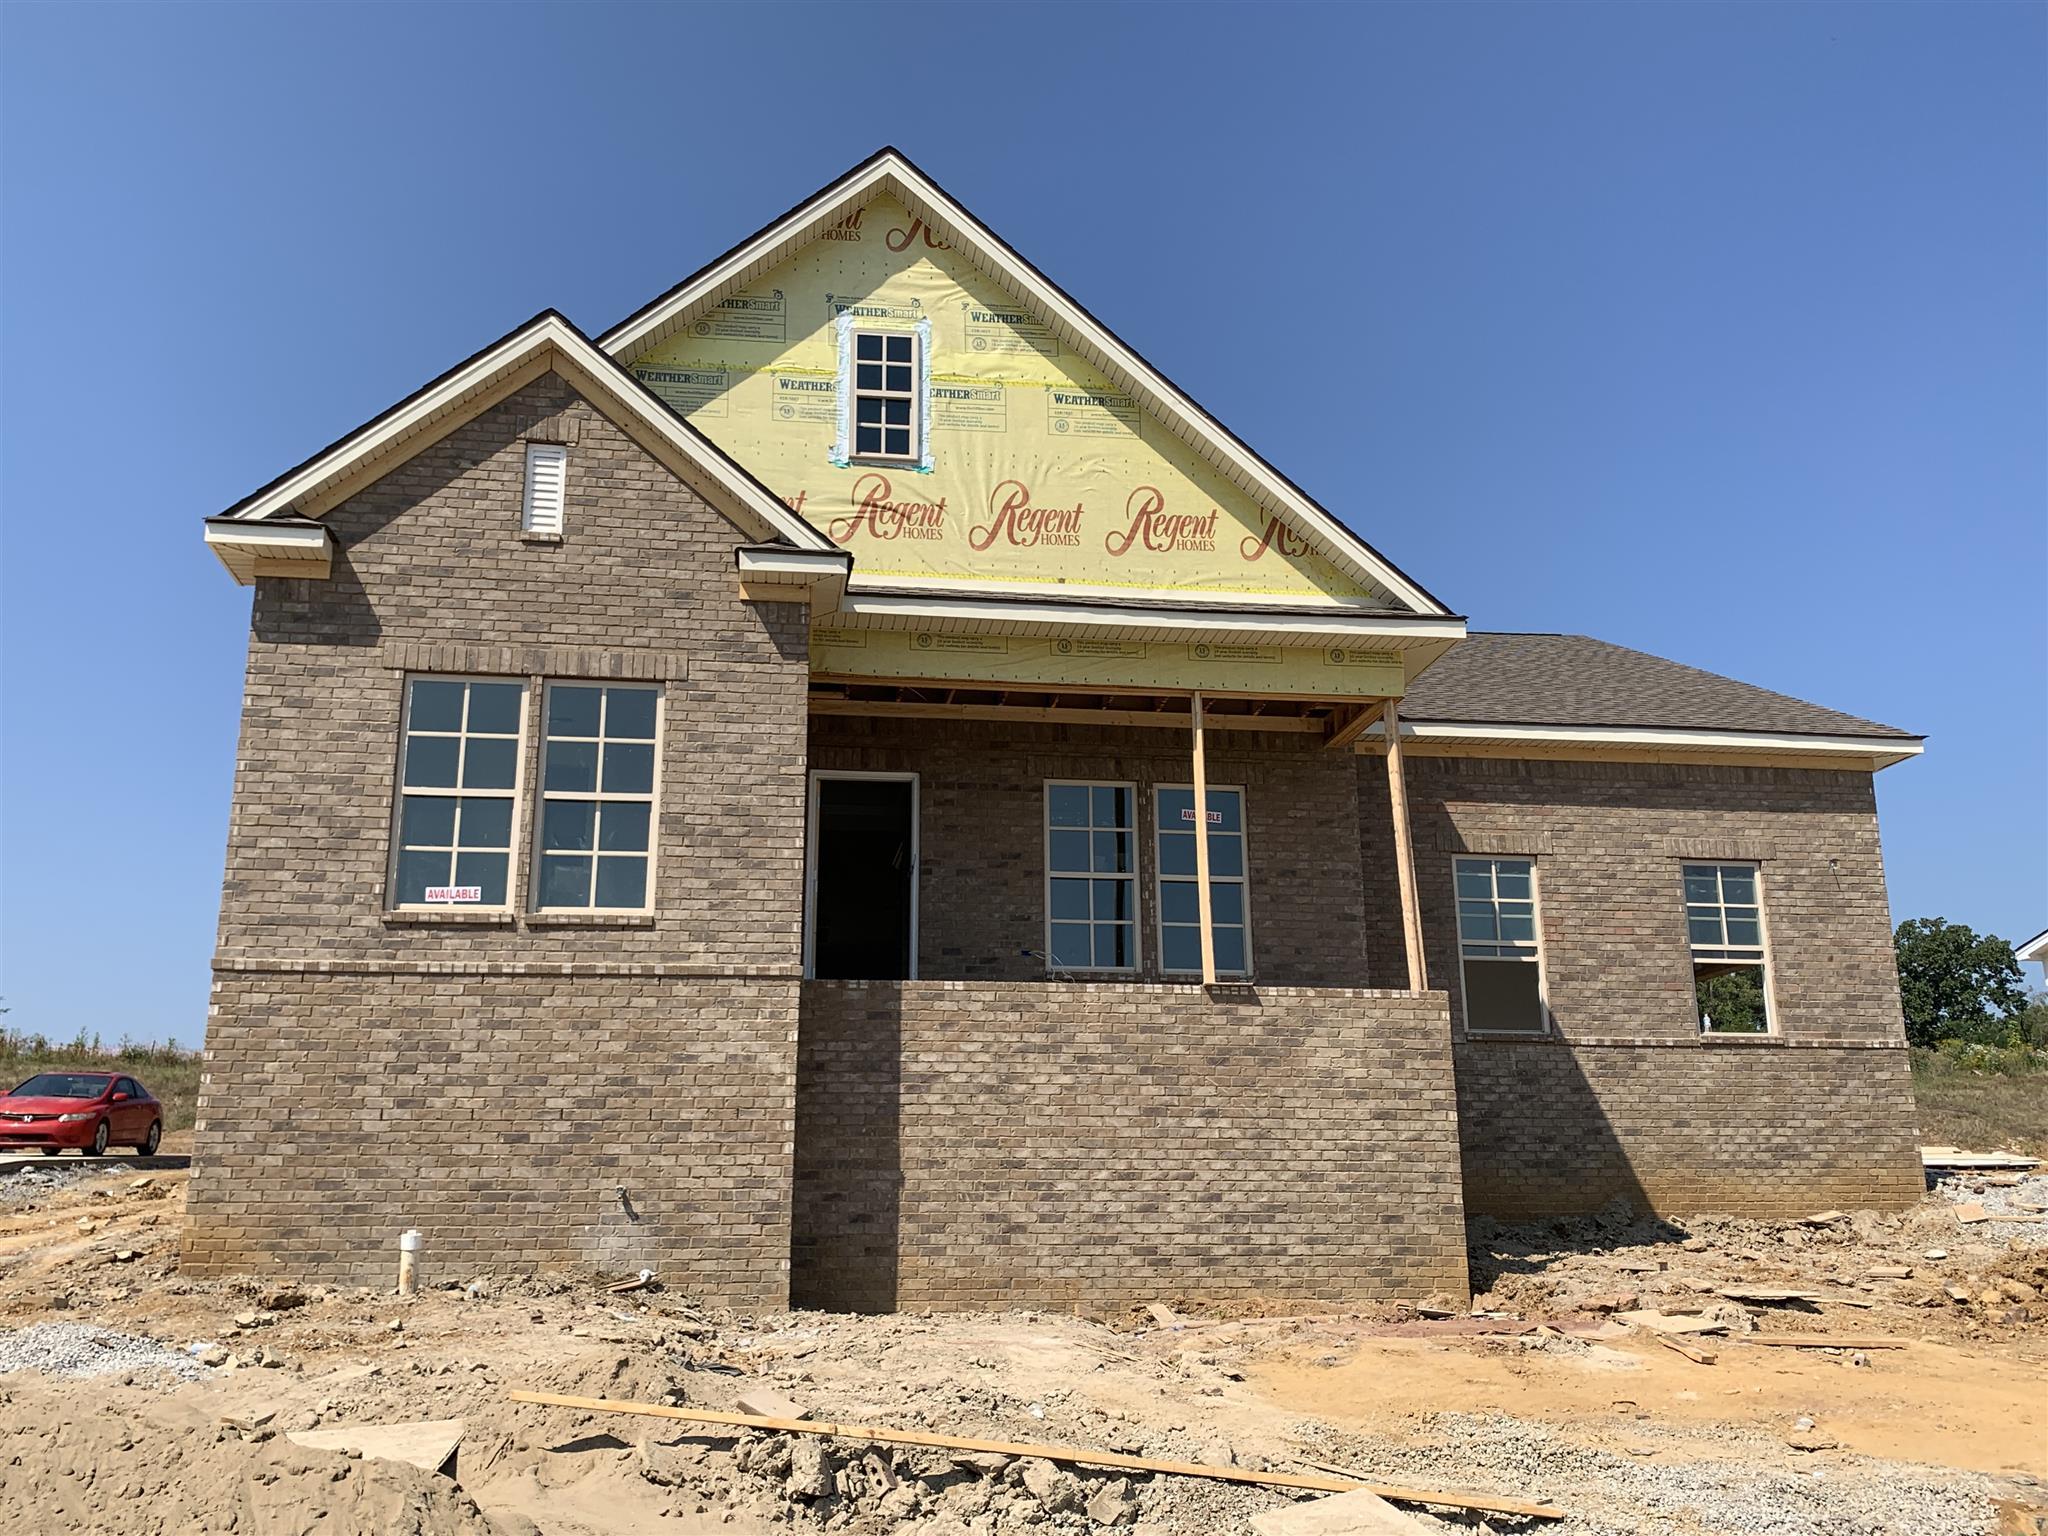 2384 Fairchild Circle #195, Nolensville, TN 37135 - Nolensville, TN real estate listing